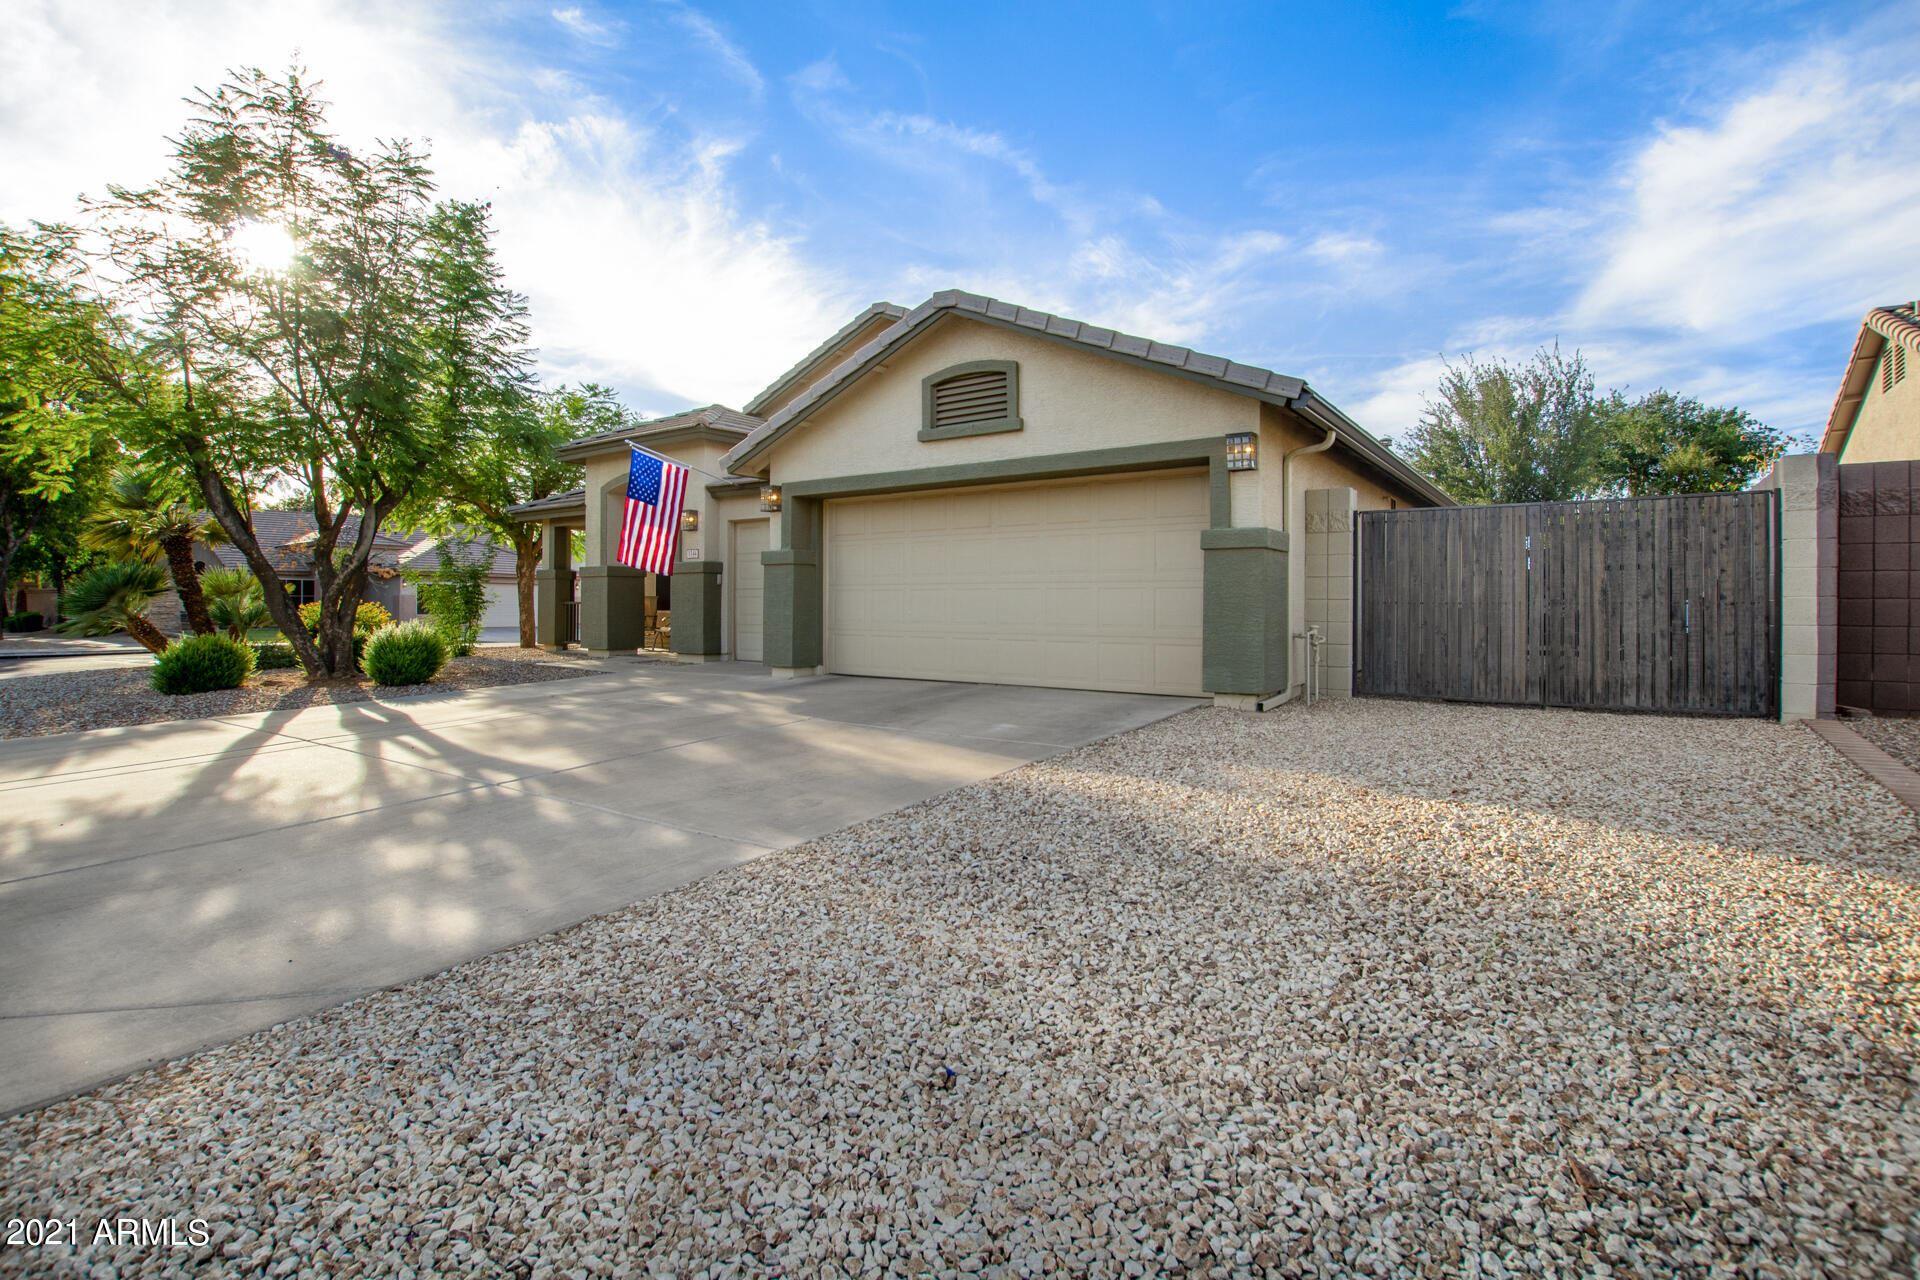 Photo of 1144 E TOLEDO Street, Gilbert, AZ 85295 (MLS # 6249313)